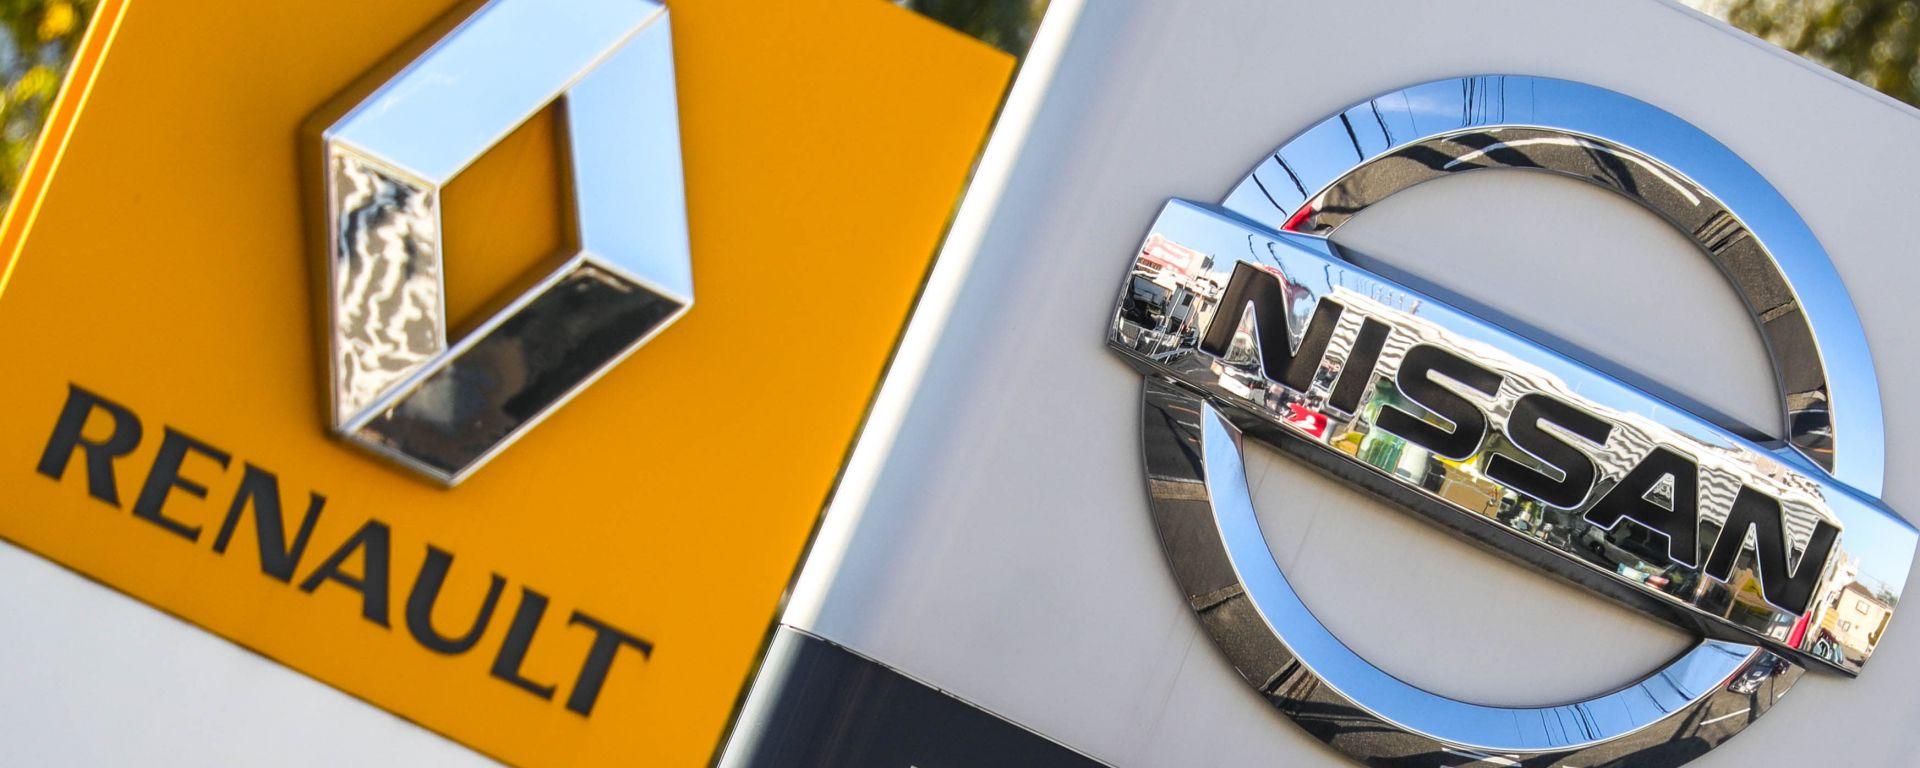 Renault-Nissan, Alleanza in bilico